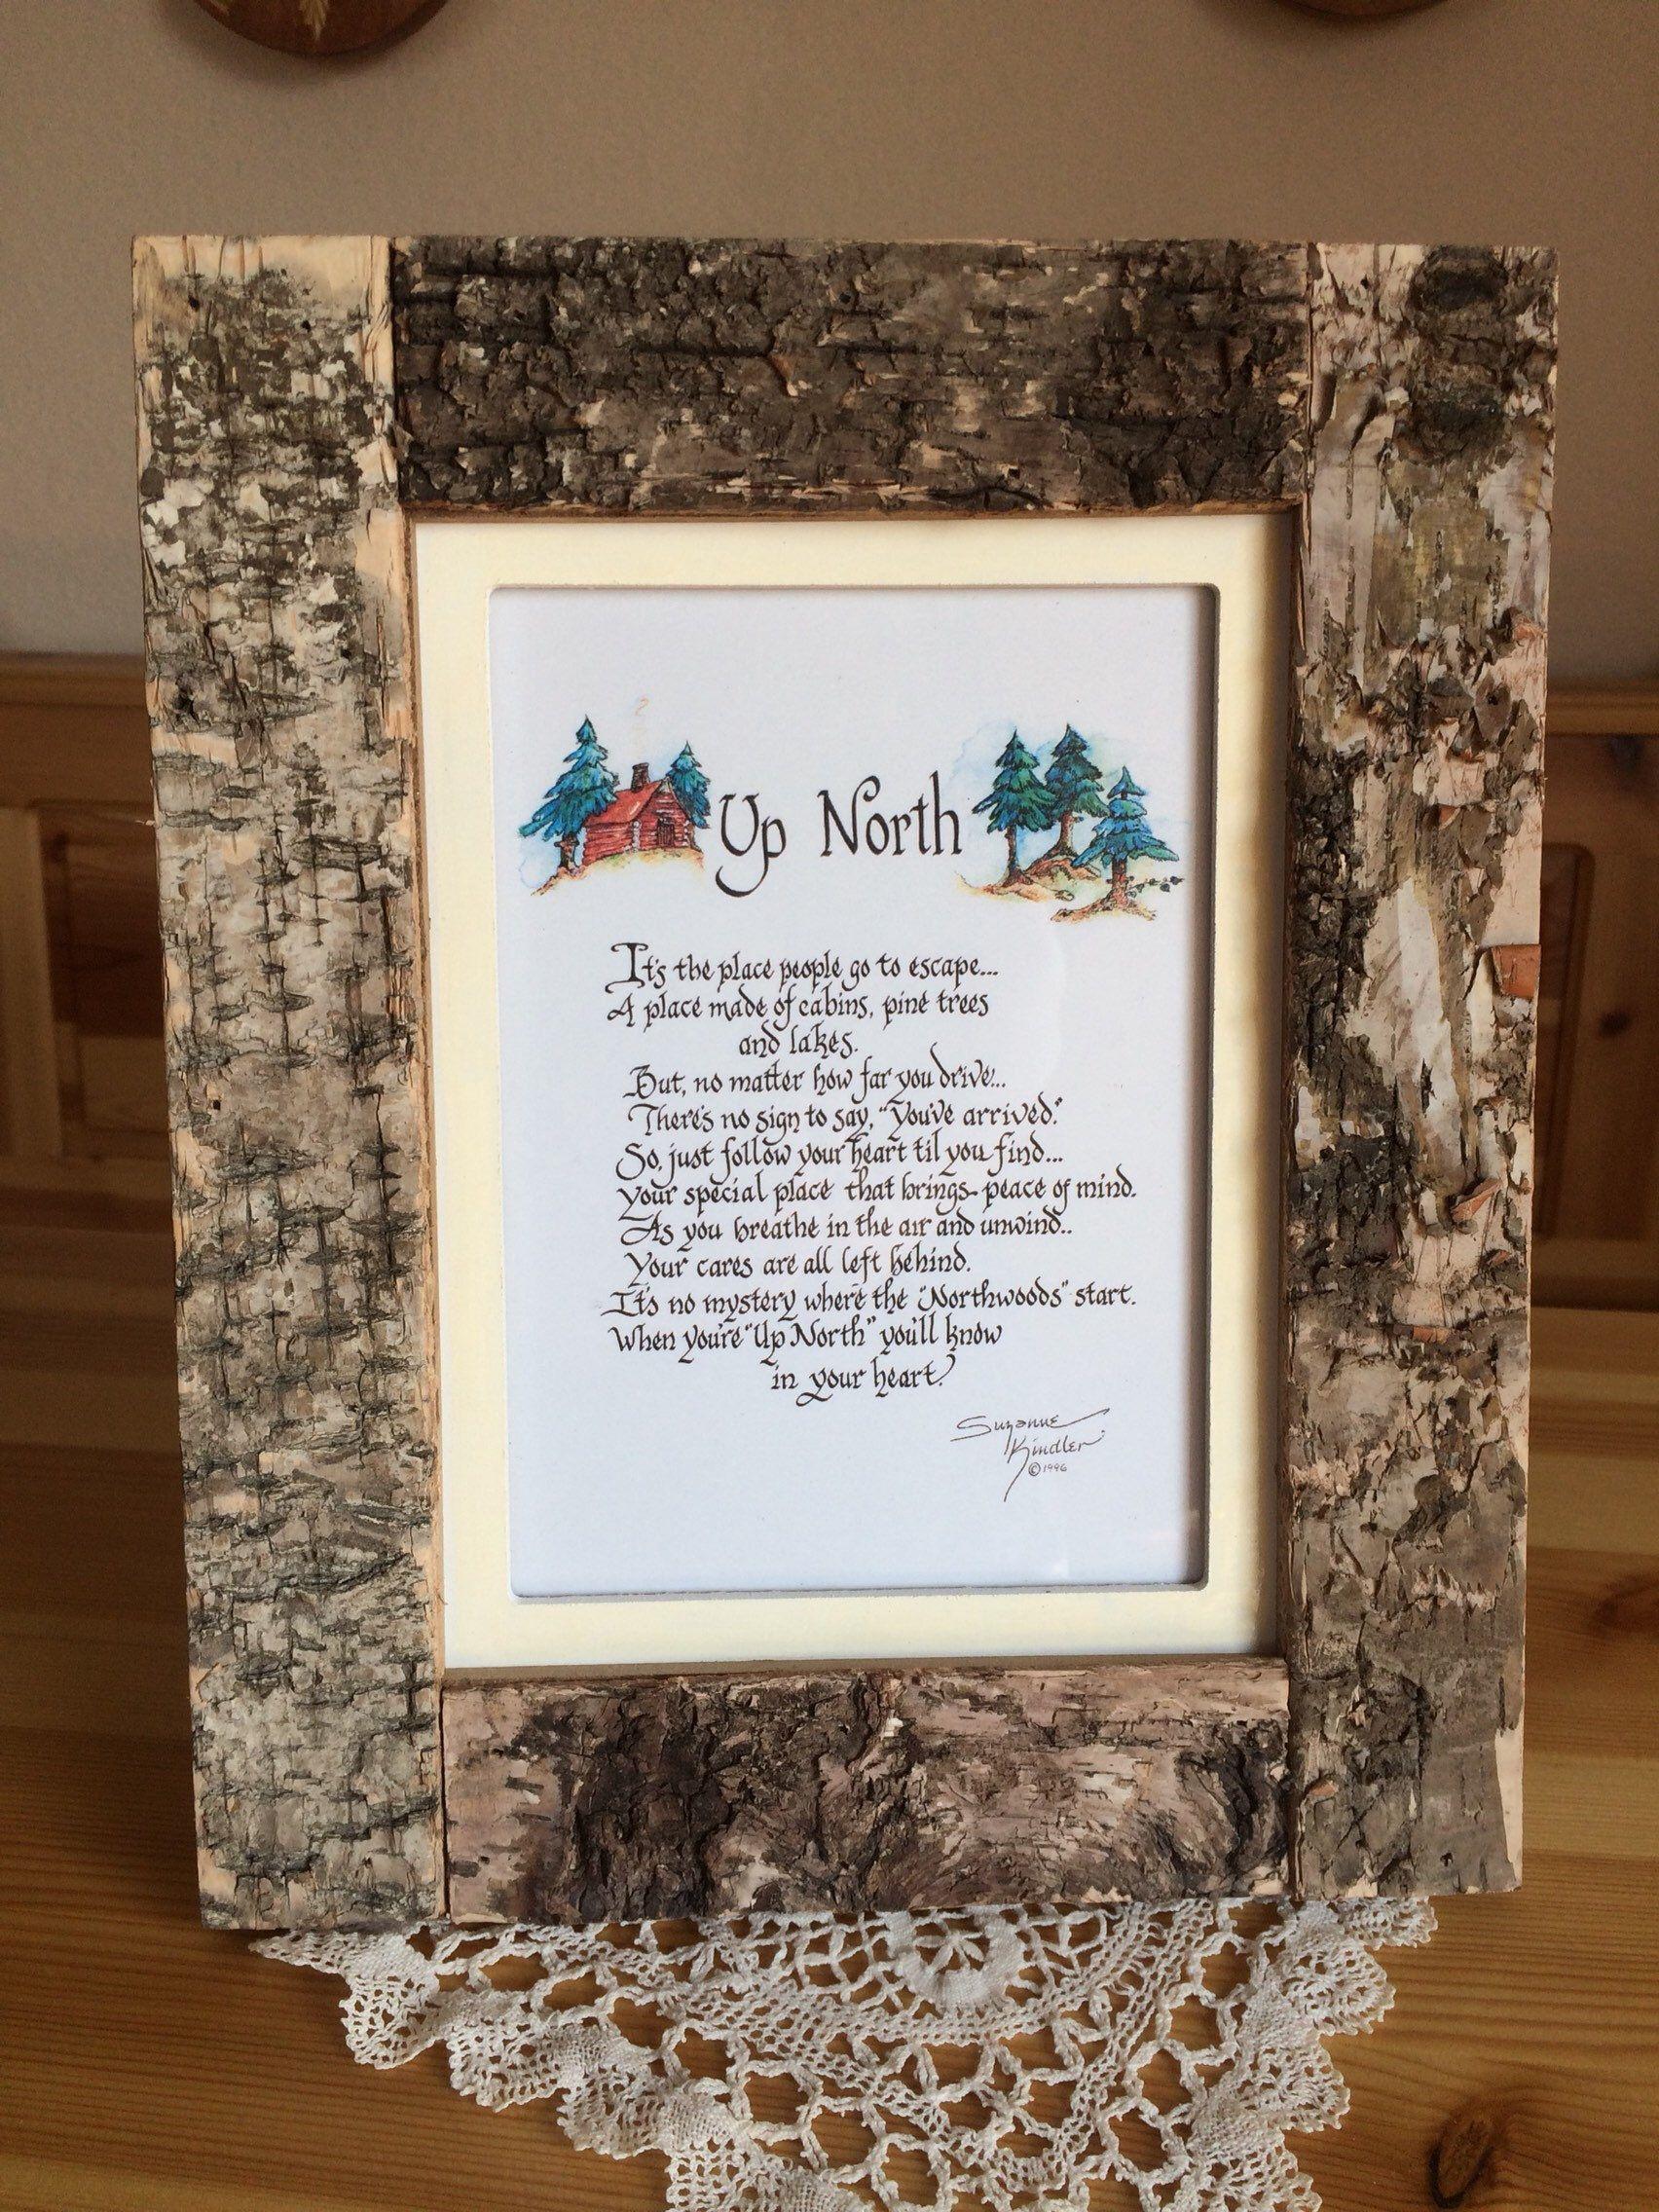 Up North Poem Lodge Decor Camper Rustic Home